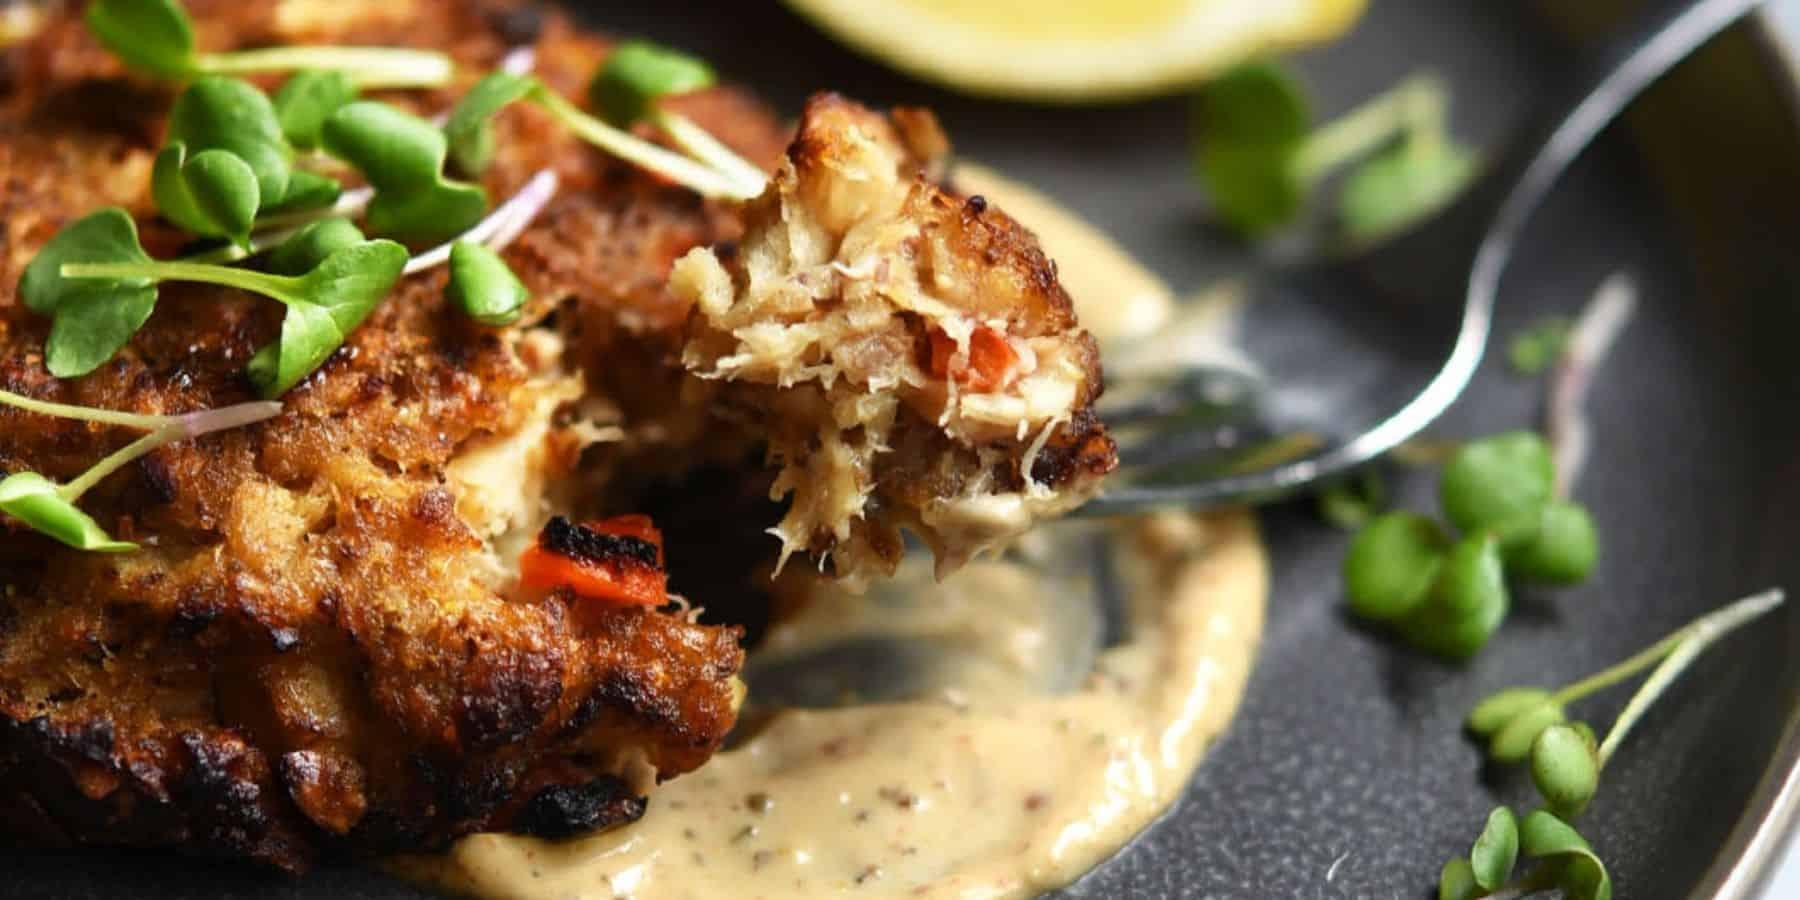 Vegan Crab Cakes with Vegan Remoulade Sauce